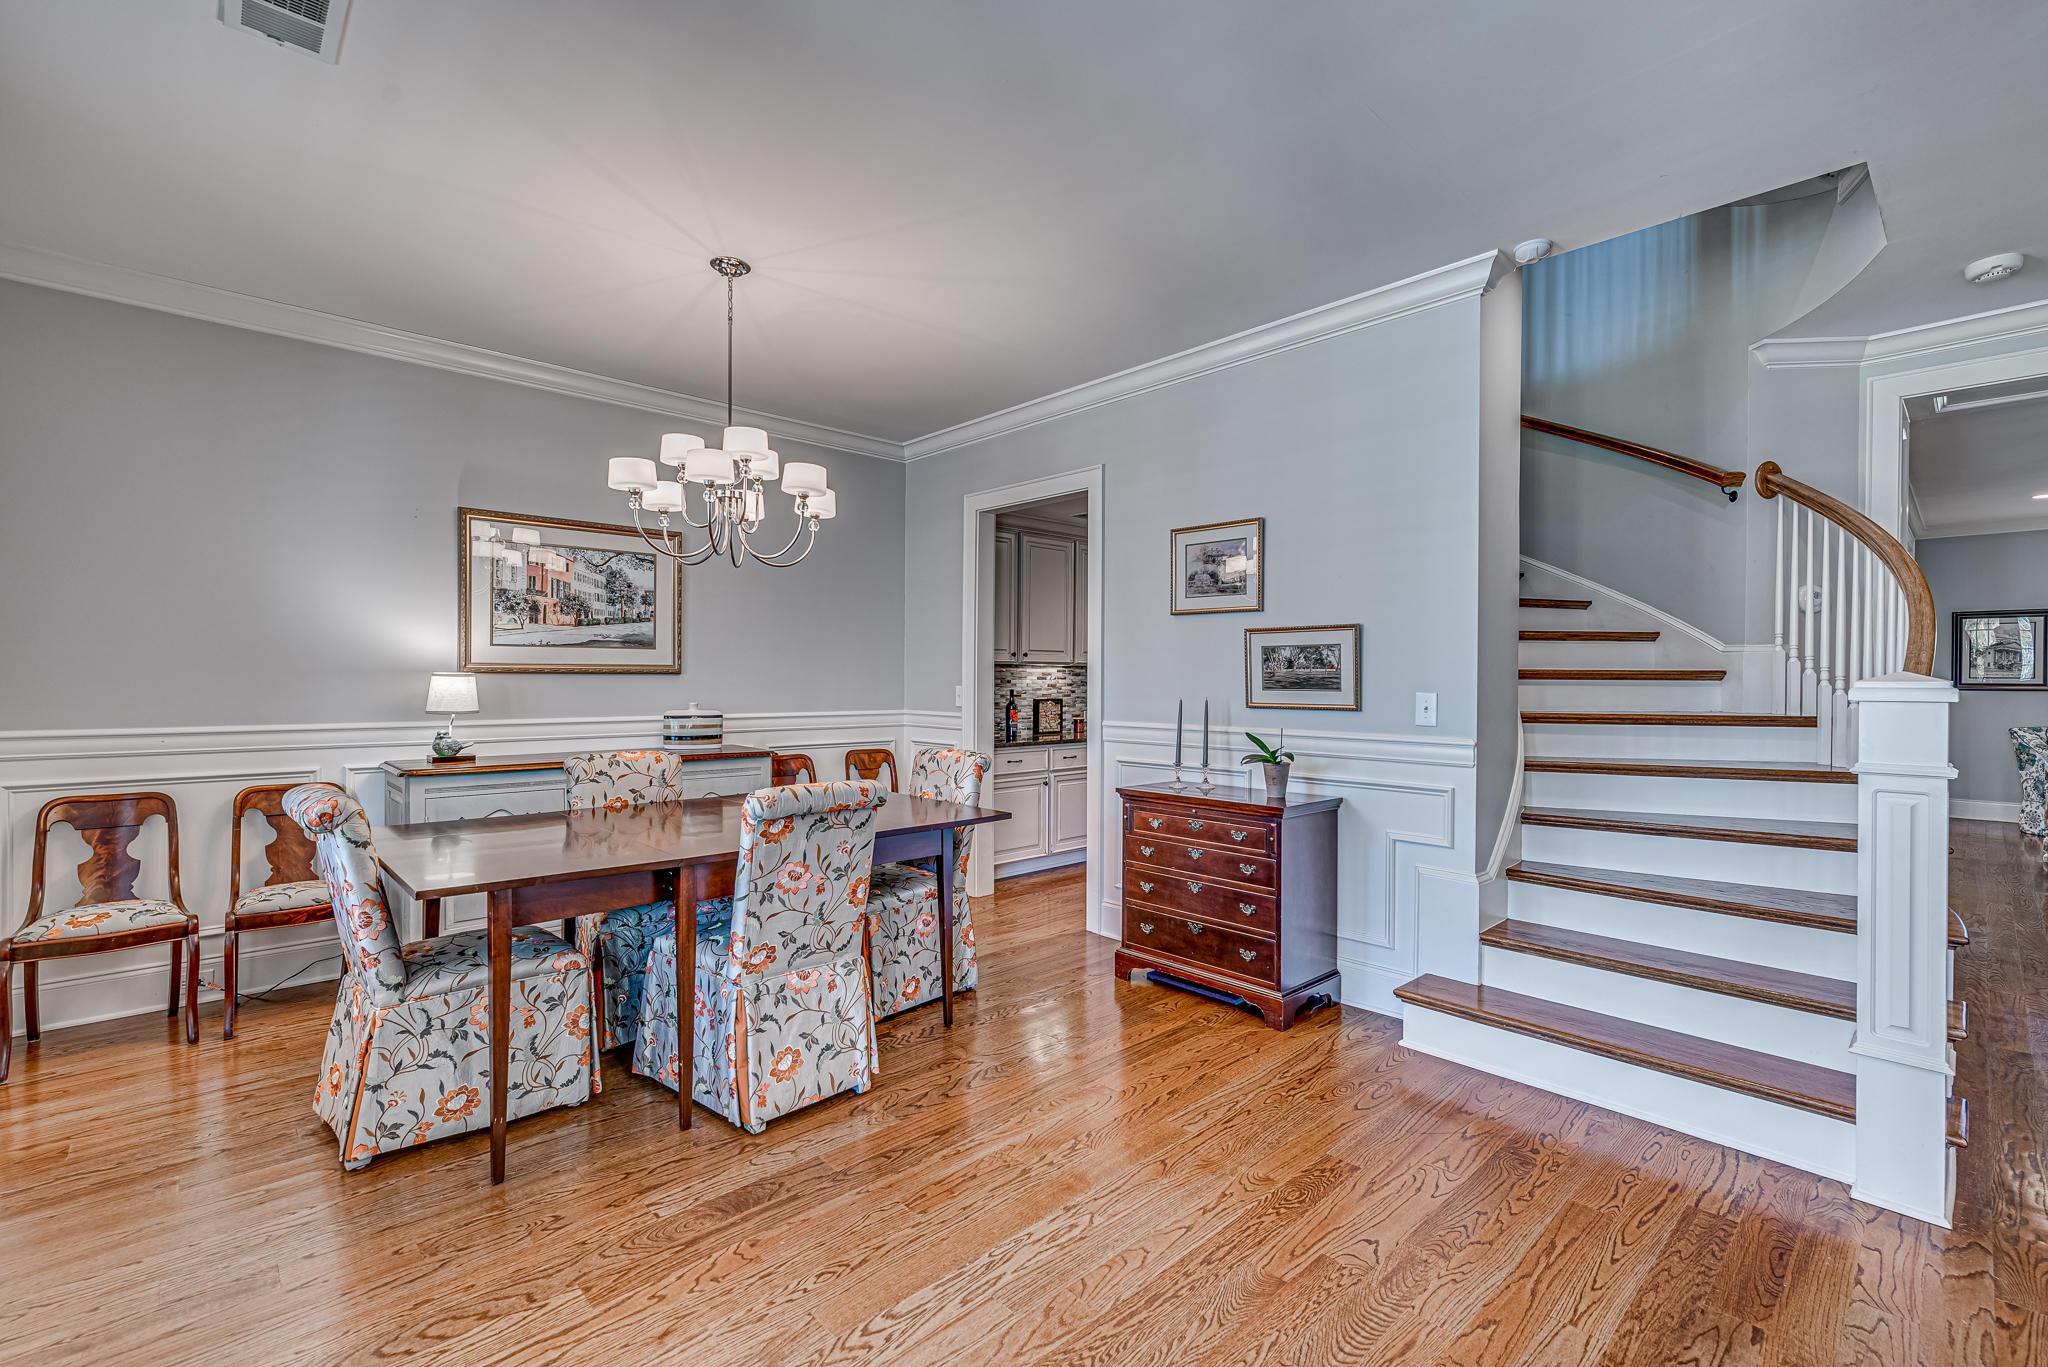 Daniel Island Smythe Park Homes For Sale - 1410 Wando View, Charleston, SC - 11